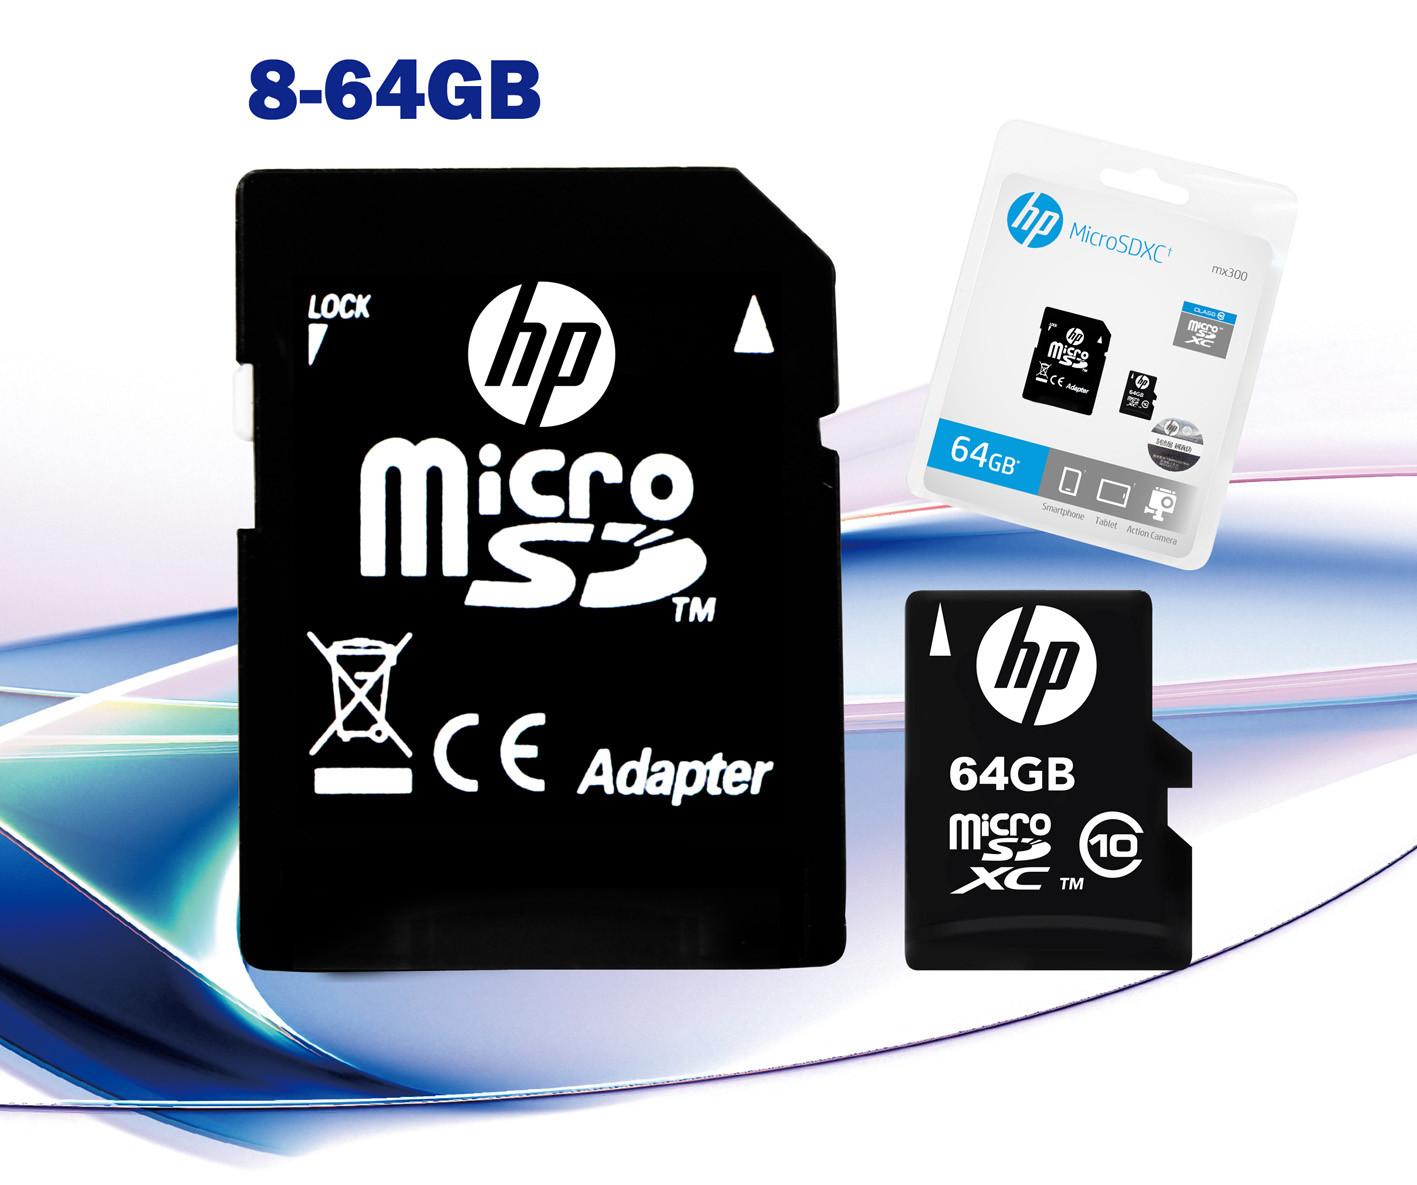 HP Micro SD Cards Image